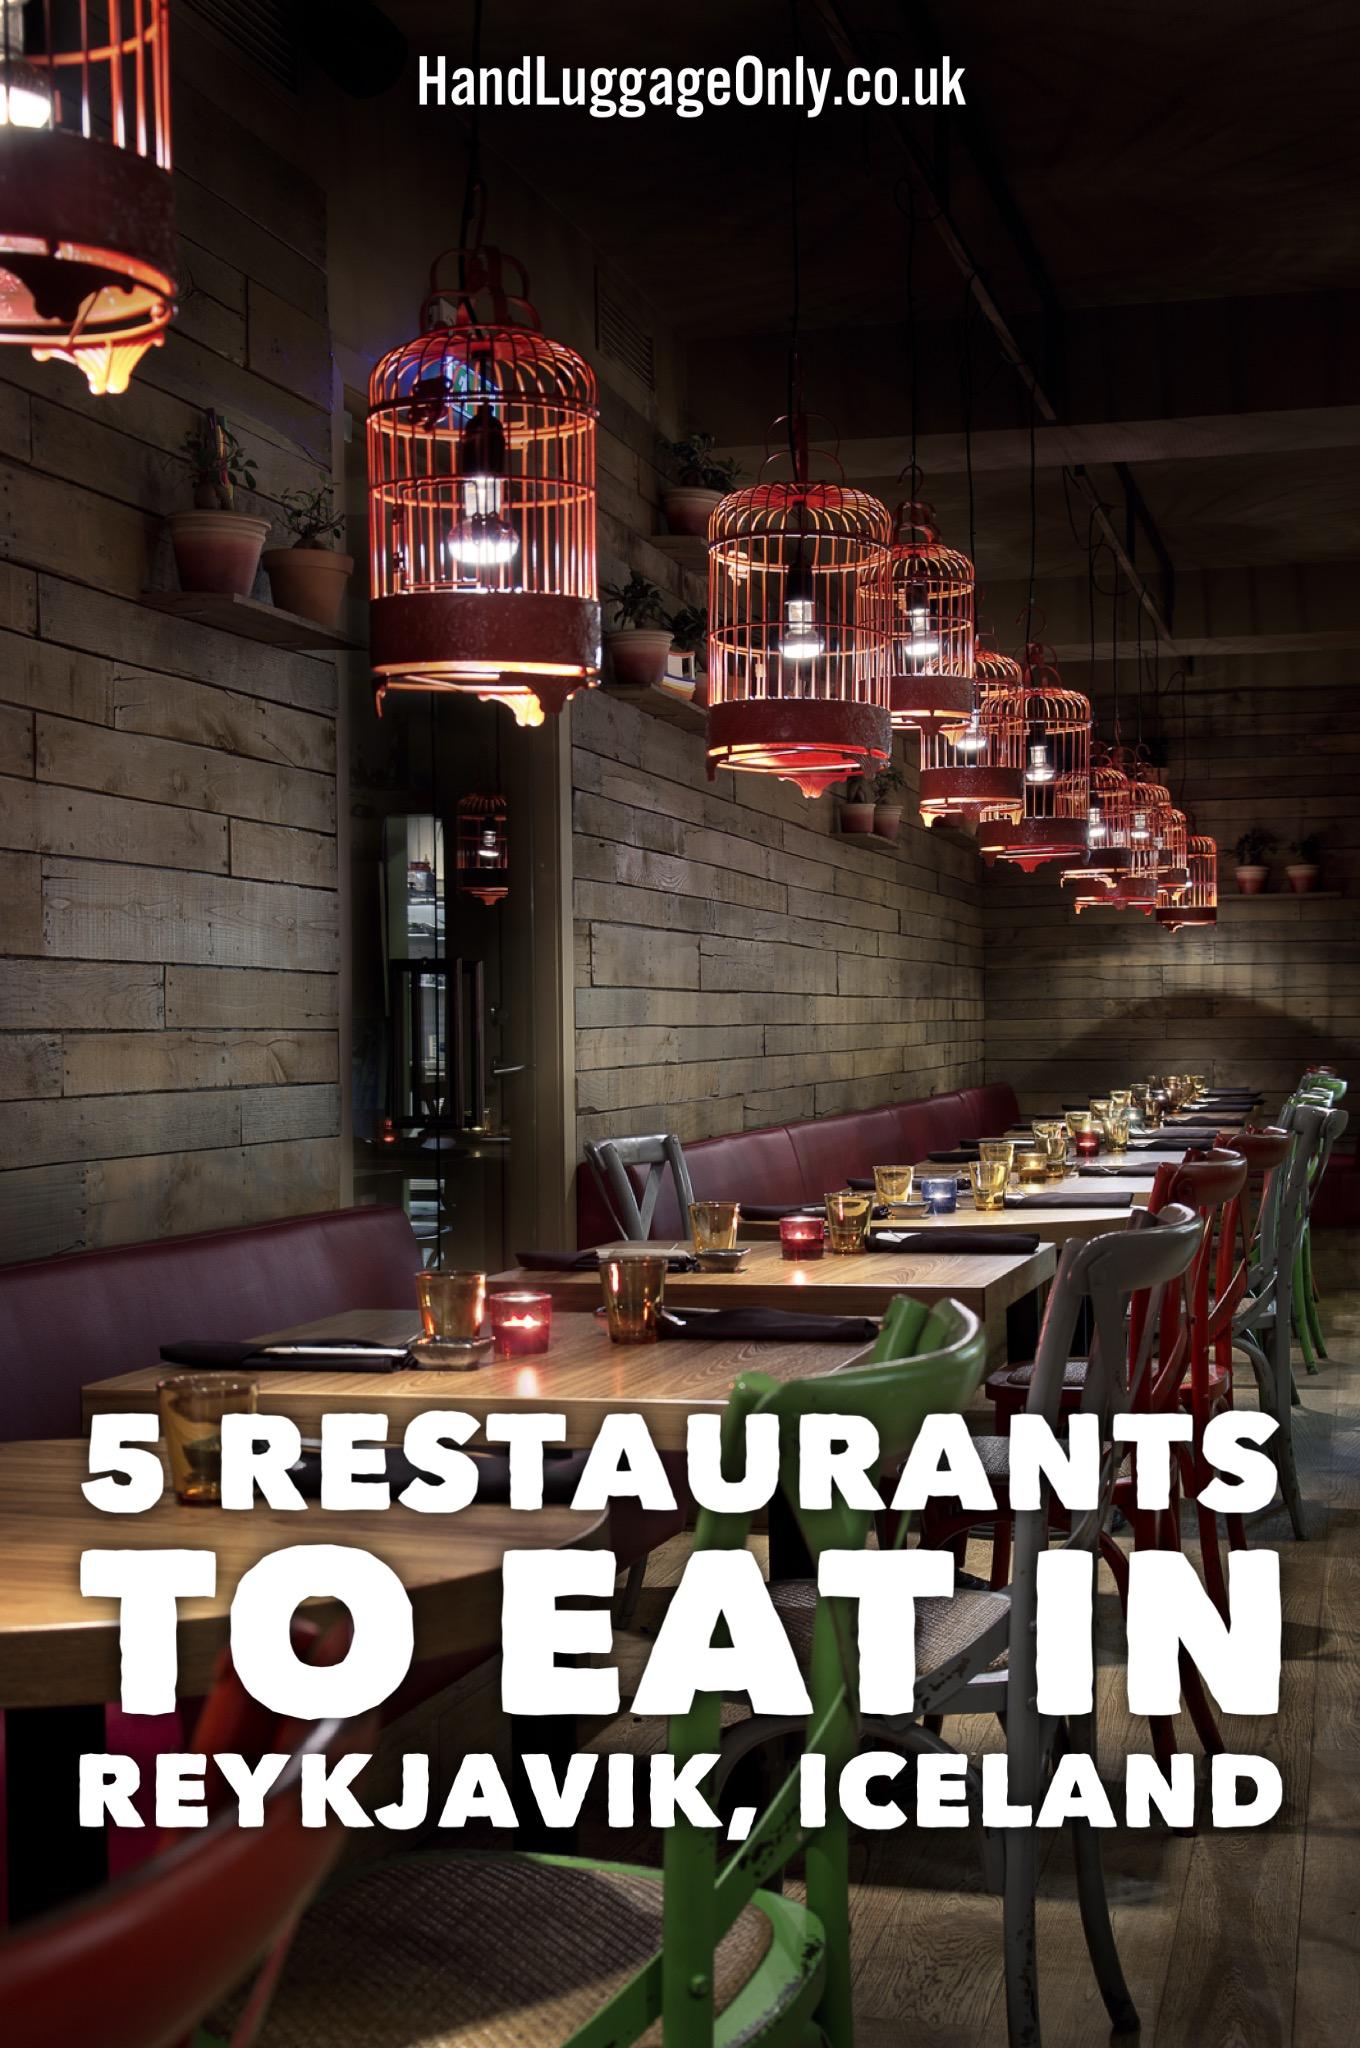 5 Unique Restaurants To Eat In Reykjavik Iceland Hand